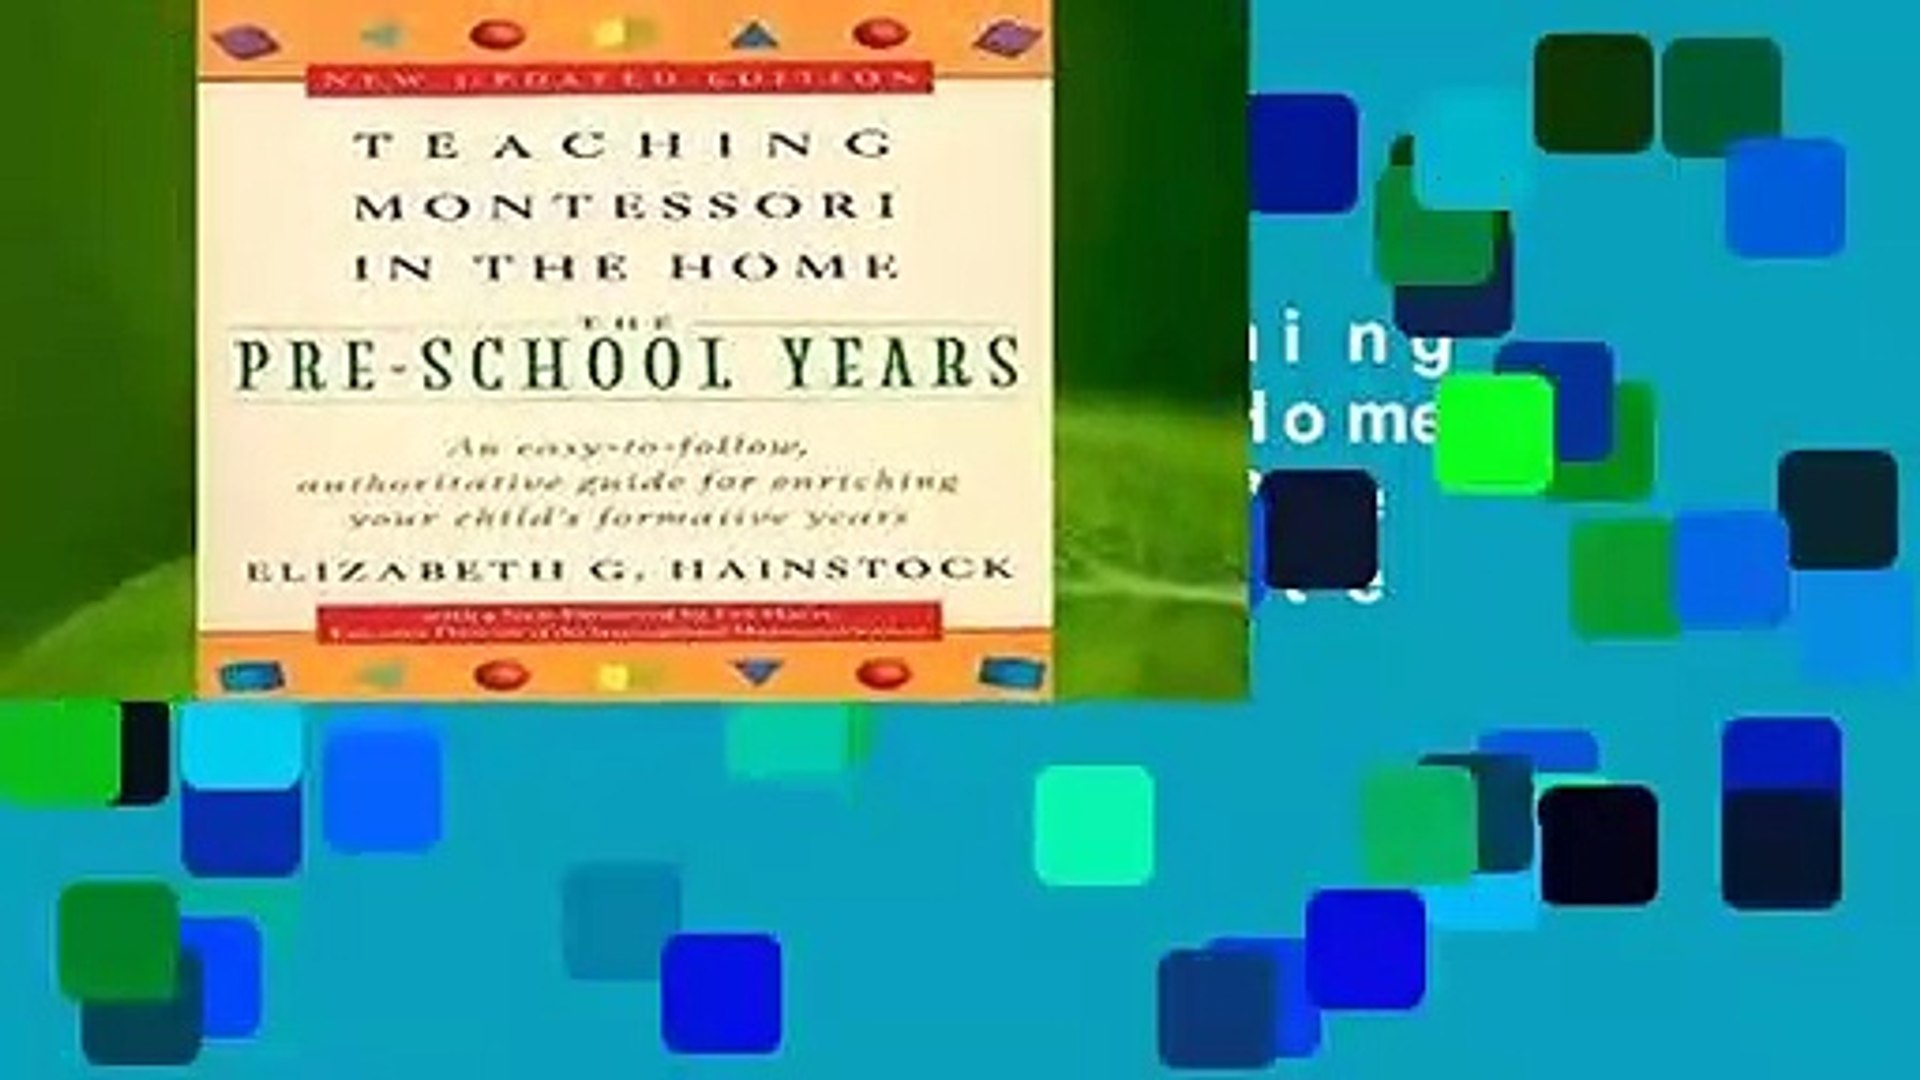 Pre-School Years Teaching Montessori in the Home The Pre-School Years